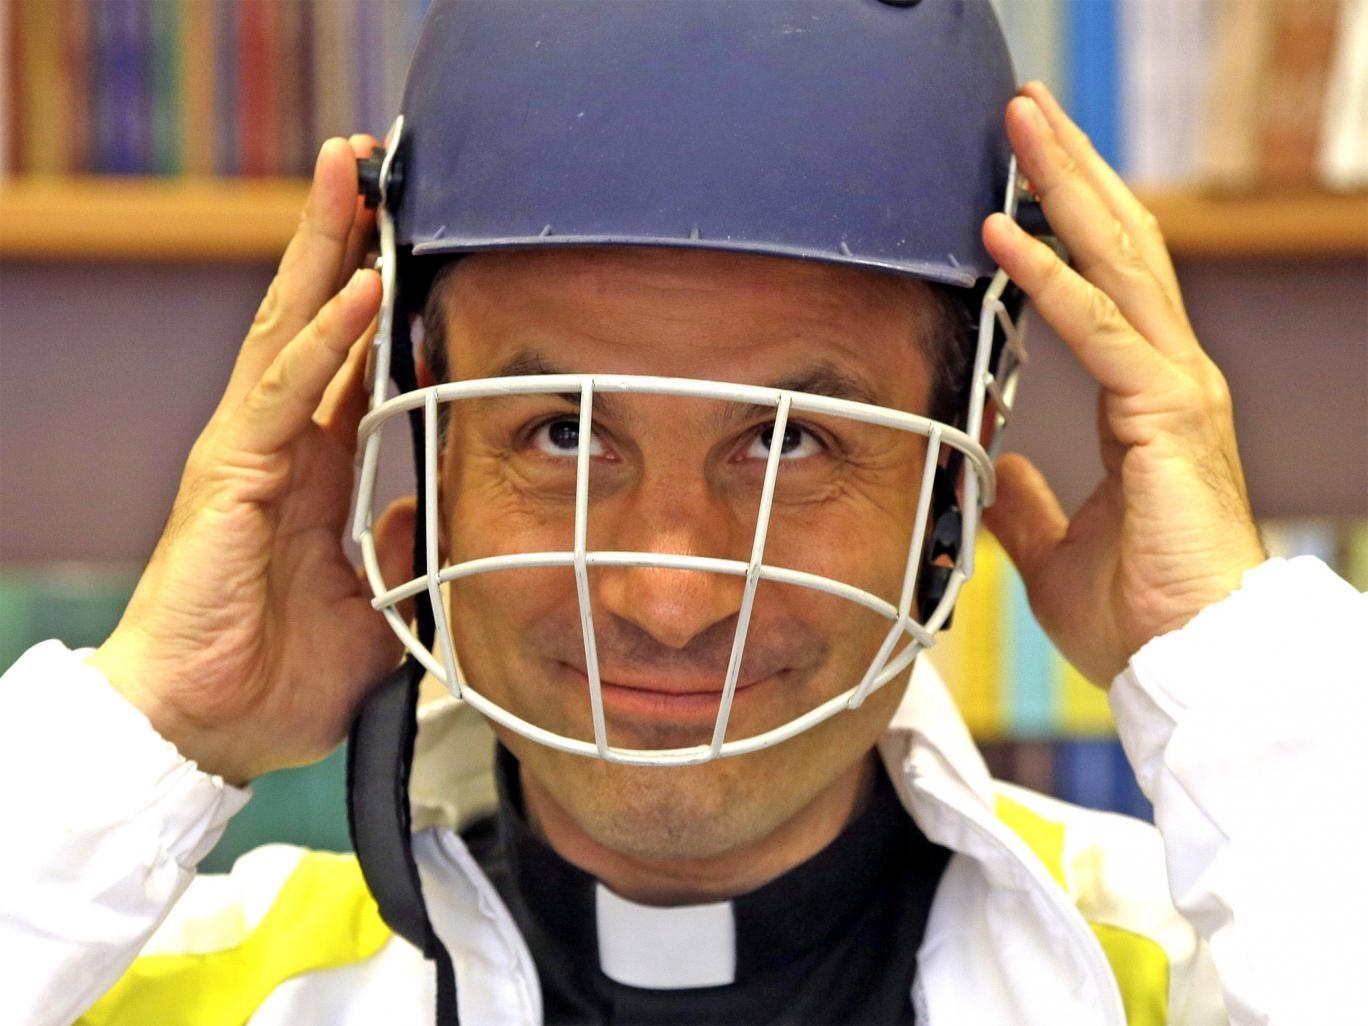 Monsignor Sanchez de Toca y Alameda, undersecretary of the Pontifical Council for Culture, wears a cricket helmet during the presentation of the Vatican cricket club at the Vatican